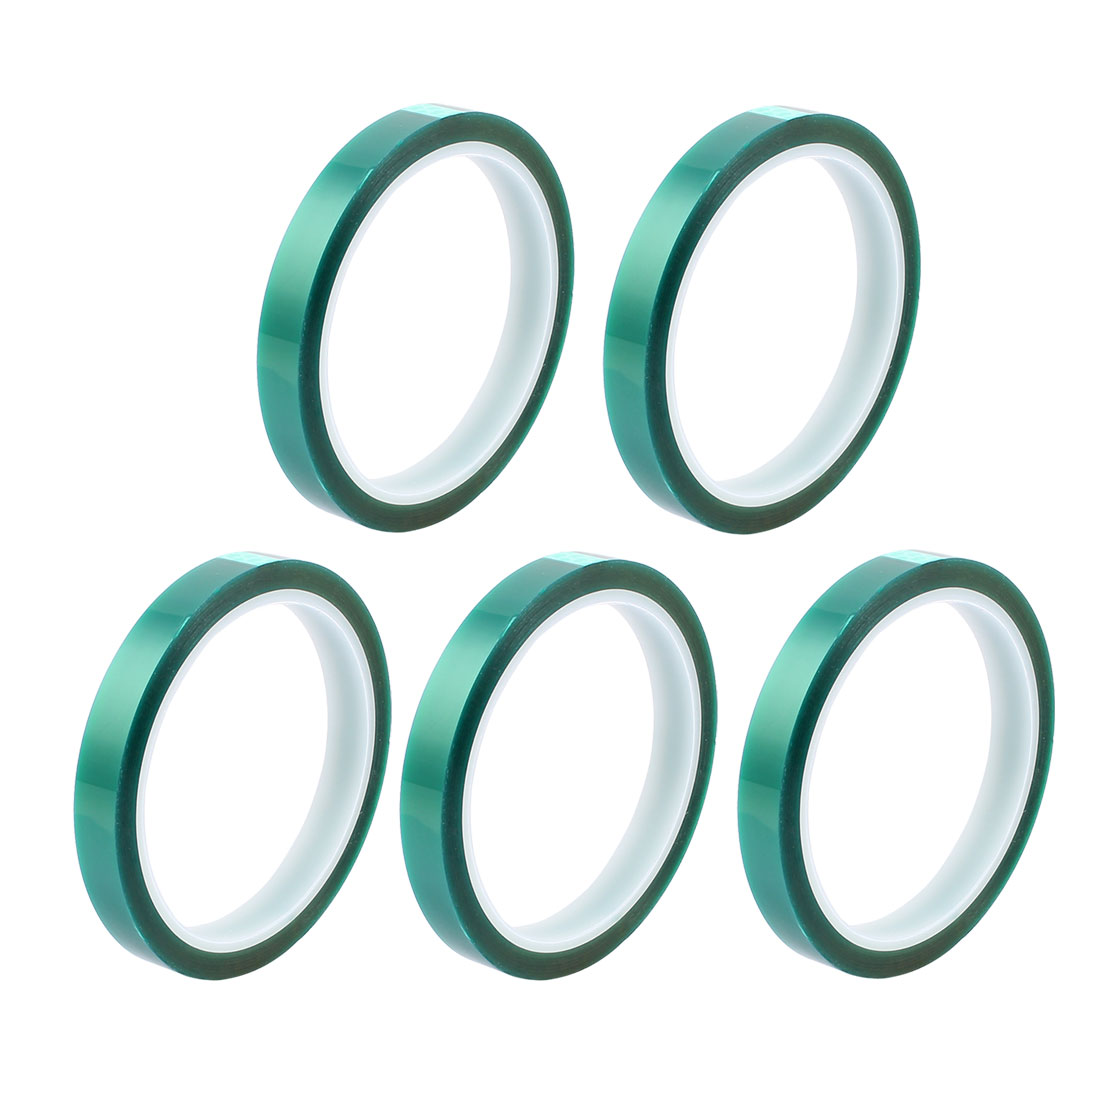 5pcs 12mm Width 33M Long Green PET High Temperature Heat Resistant PCB Solder Tape